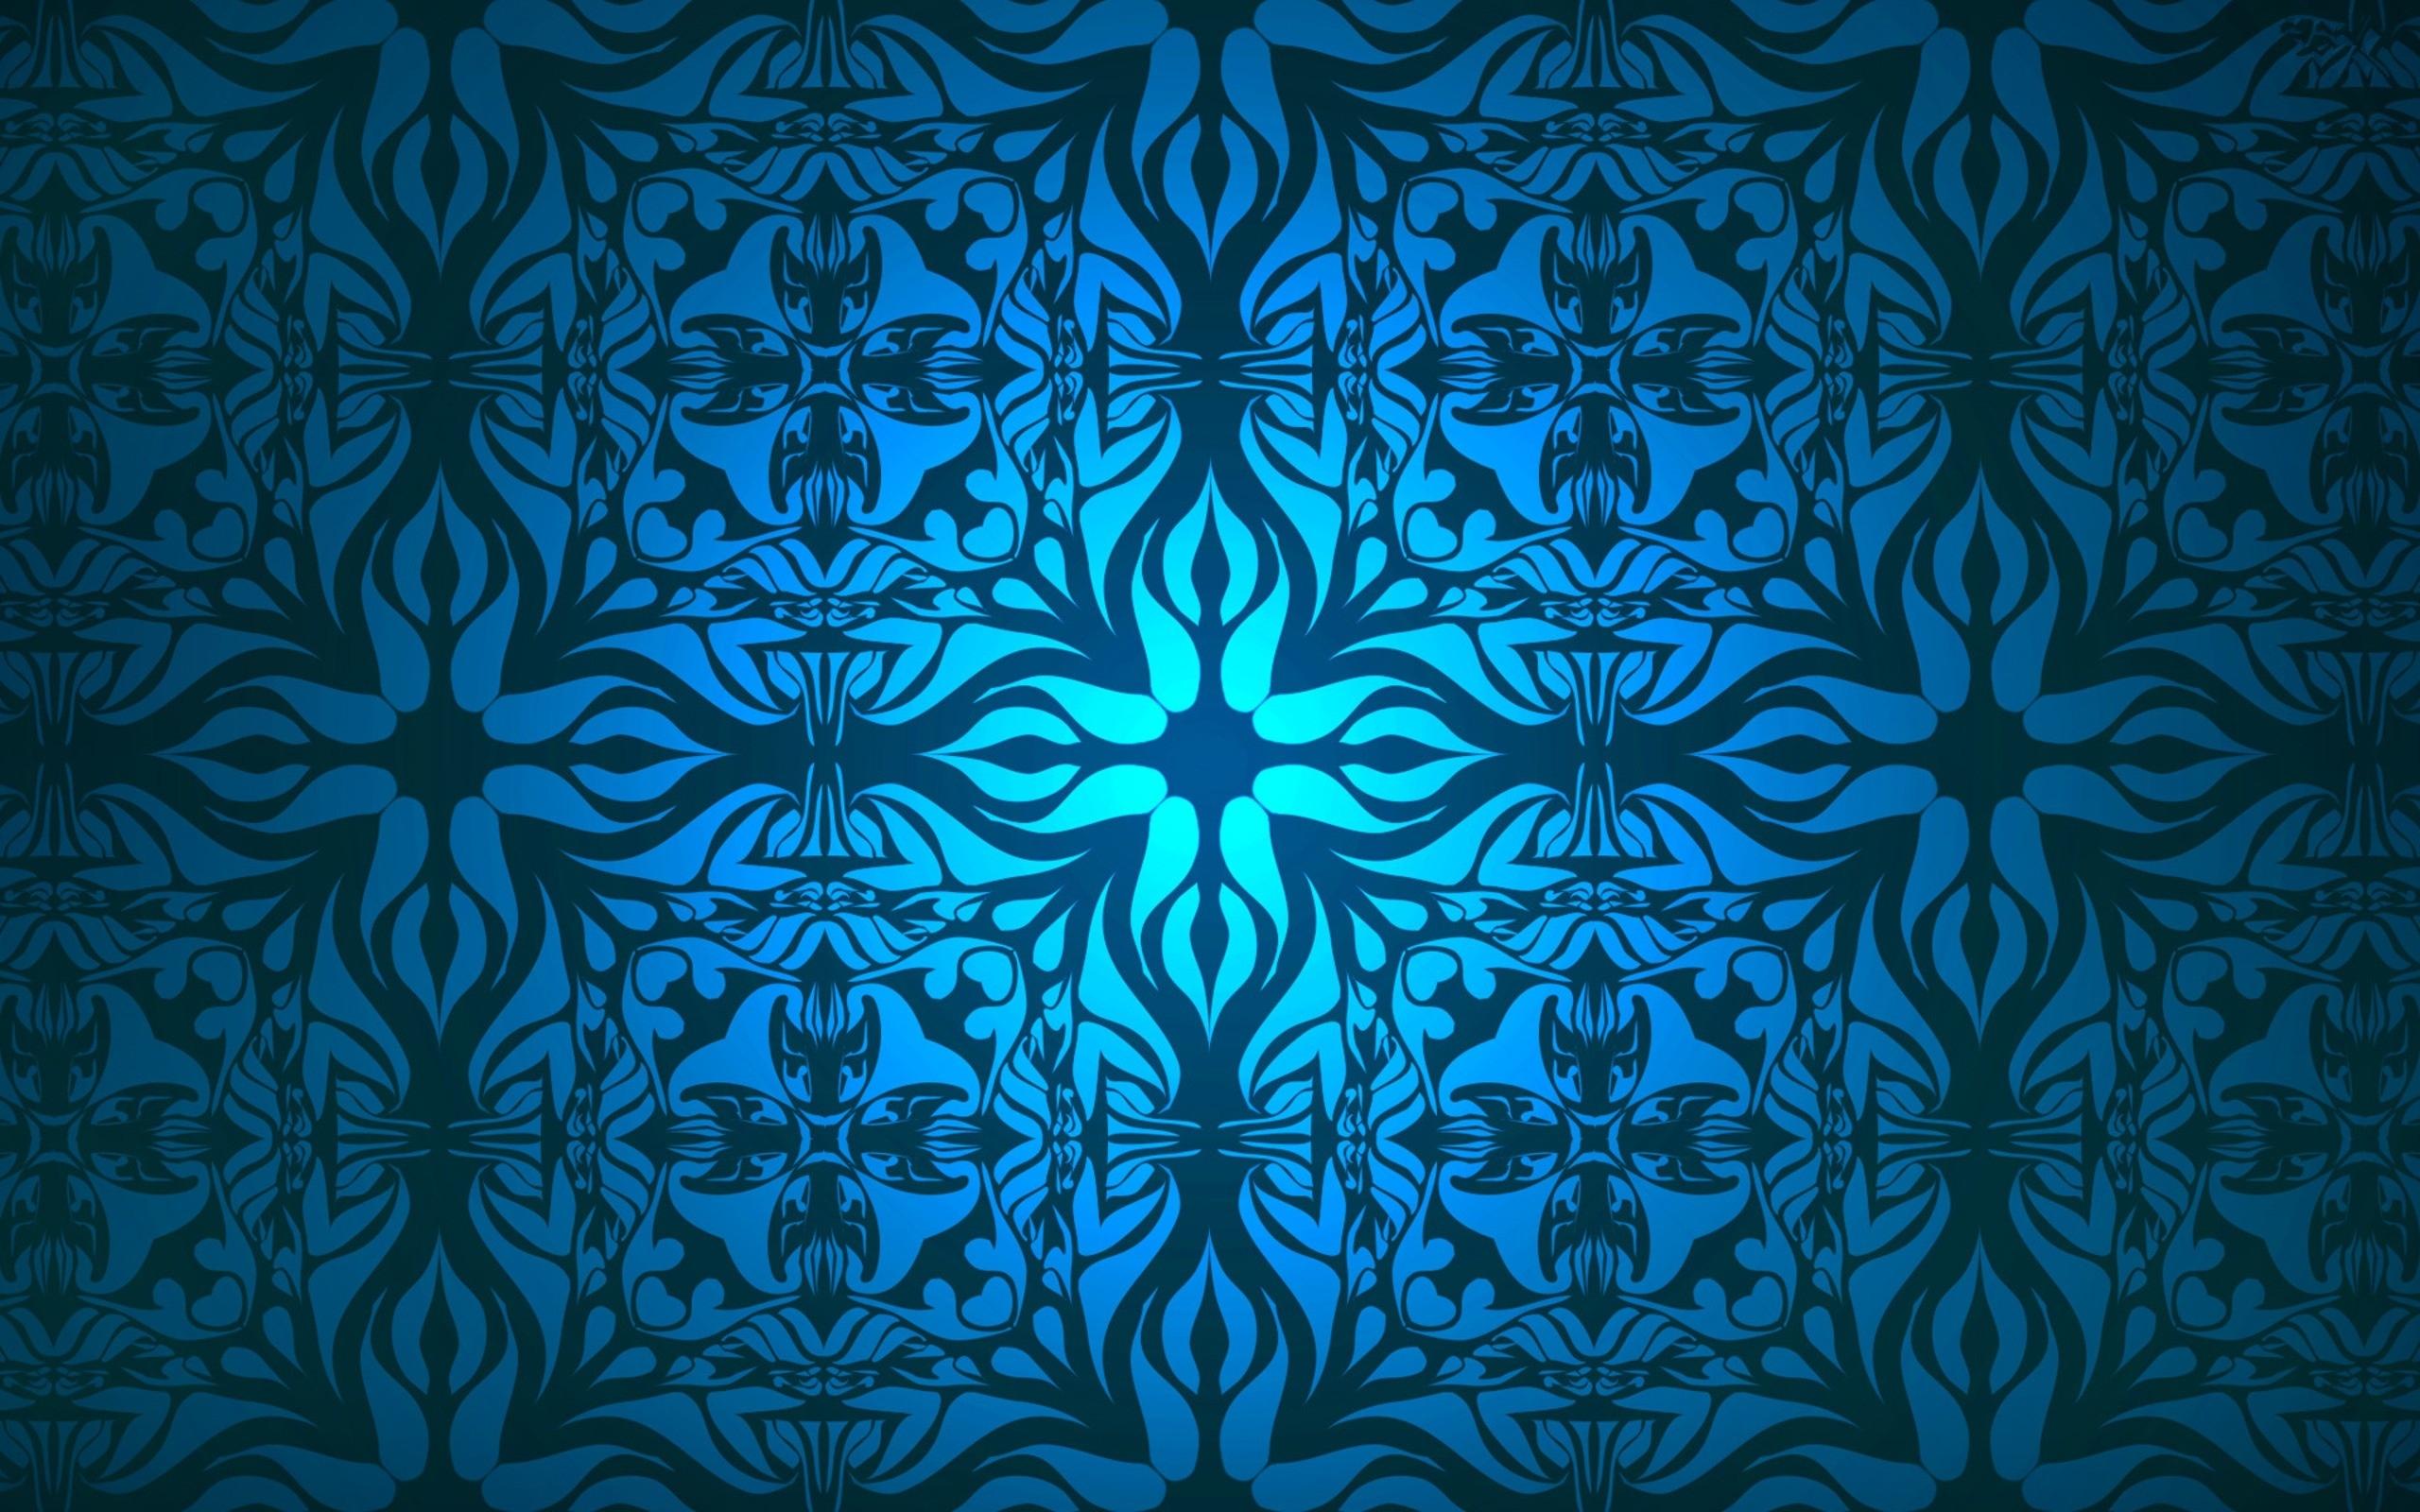 AE12 photo v09 jpeg Patterns background 2560x1600